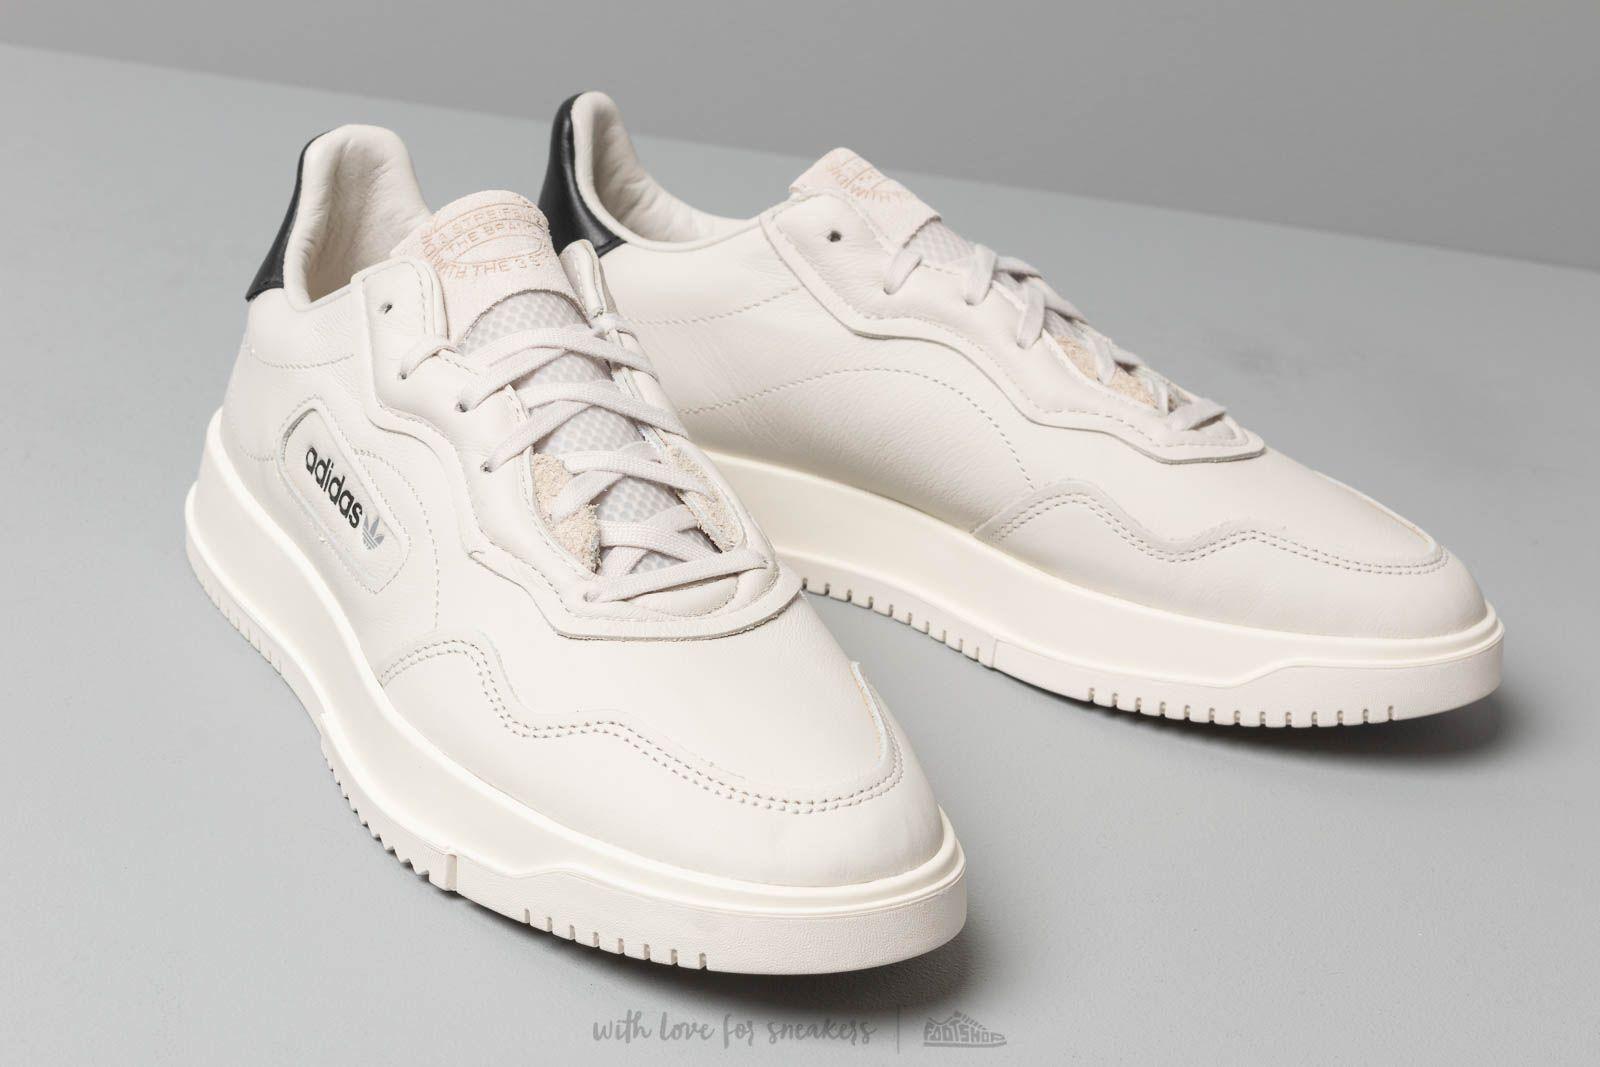 adidas Sc Premiere Raw White Chalk White Off White | Footshop